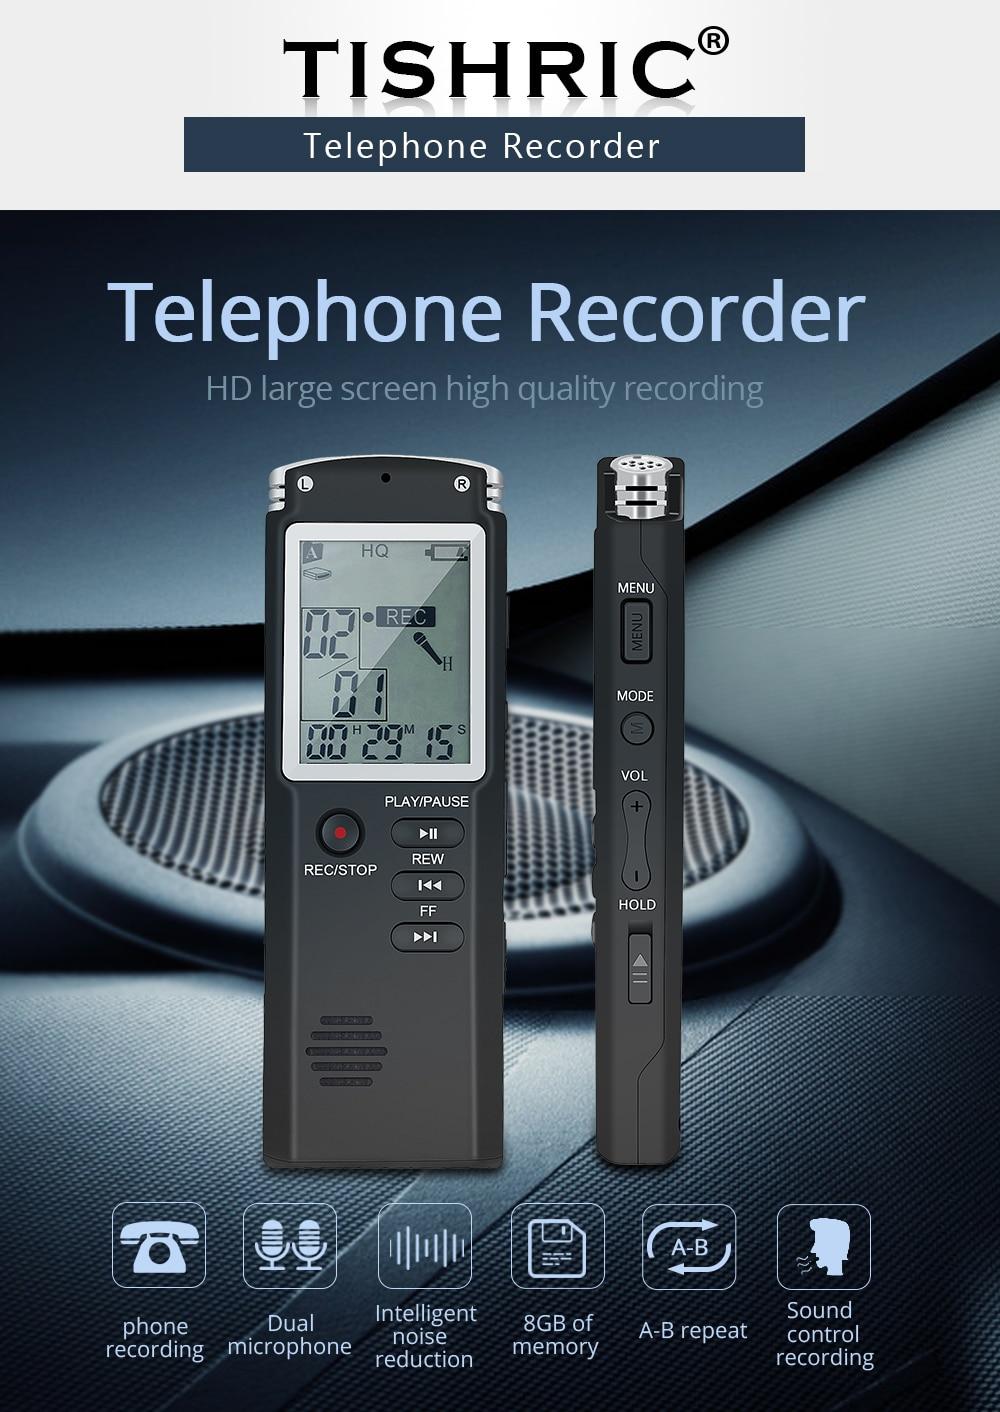 Tishric Original 8GB USB Voice Activated Recorder Telephone Audio Recorder  Recordin Mini Dictaphone With WAV,MP3 Player